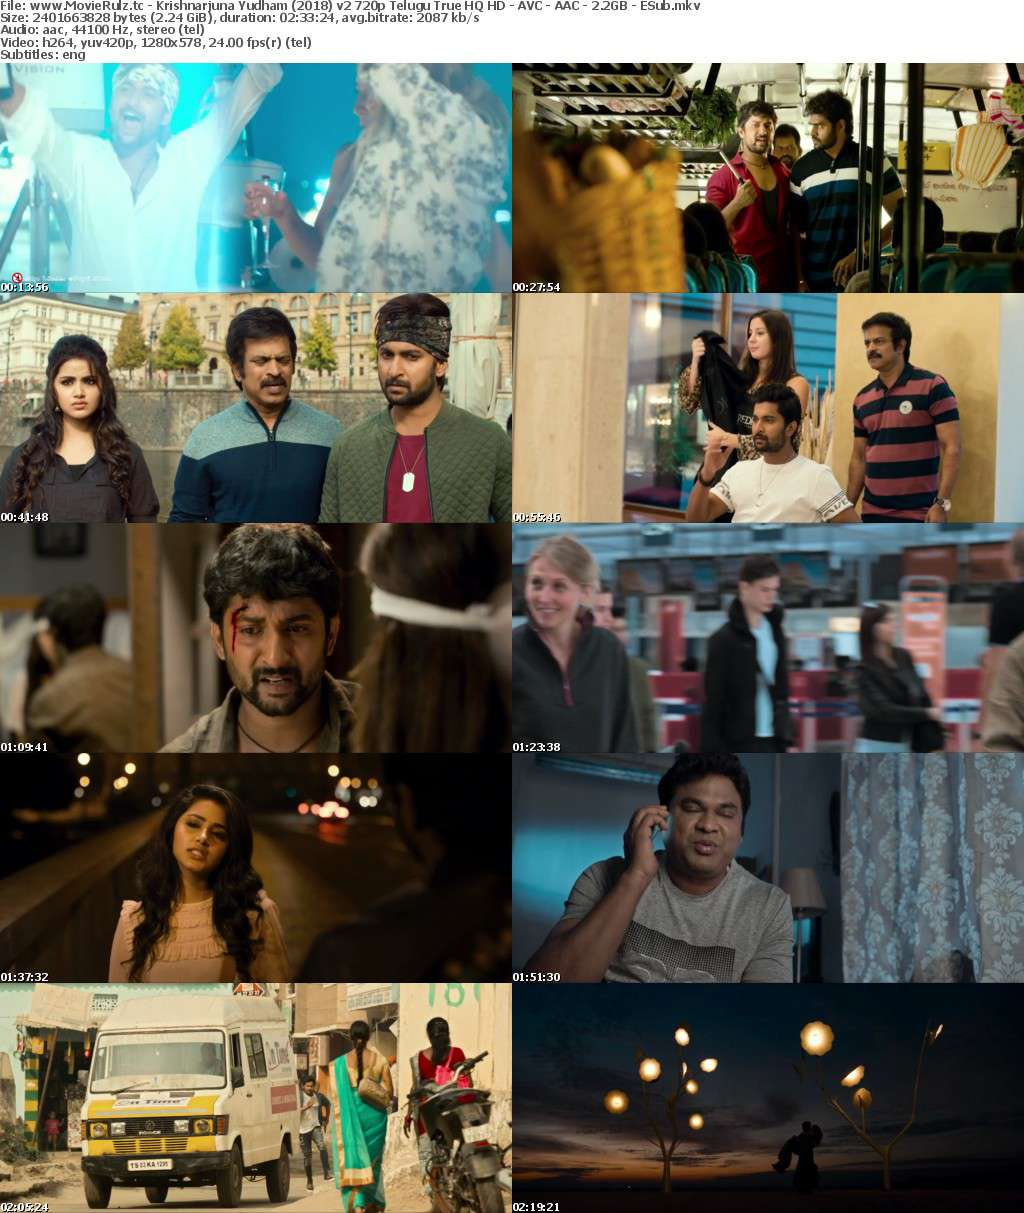 Krishnarjuna Yudham (2018) v2 720p Telugu True HQ HD - AVC - AAC - 2 2GB - ESub